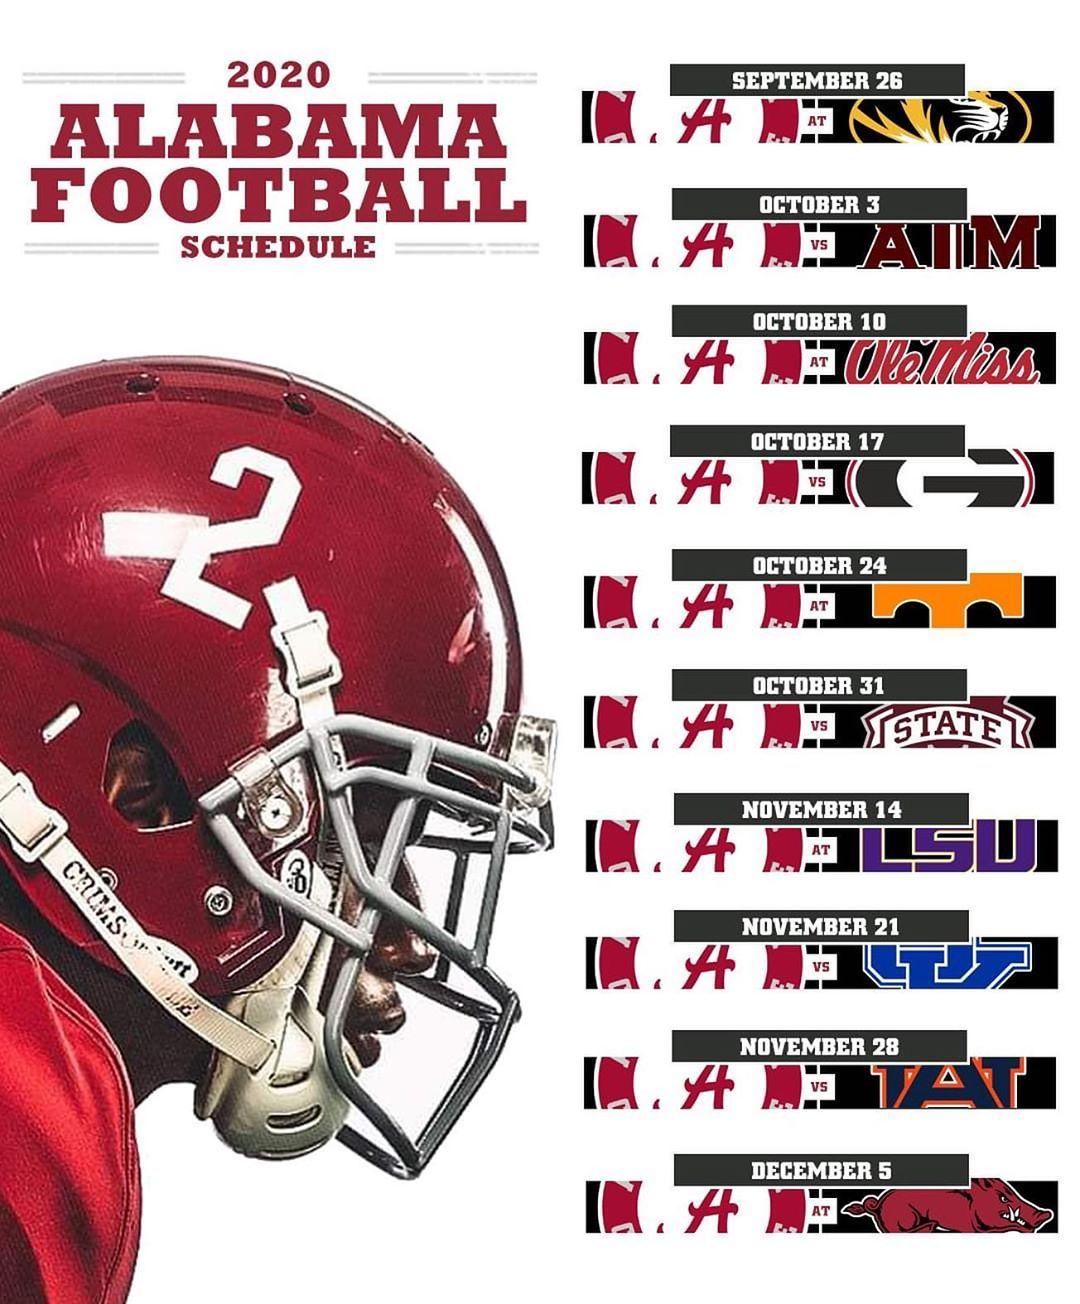 Pin By Bill Phillips On Alabama Crimson Tide In 2020 Alabama Crimson Tide Football Alabama Crimson Tide Football Wallpaper Alabama Football Schedule